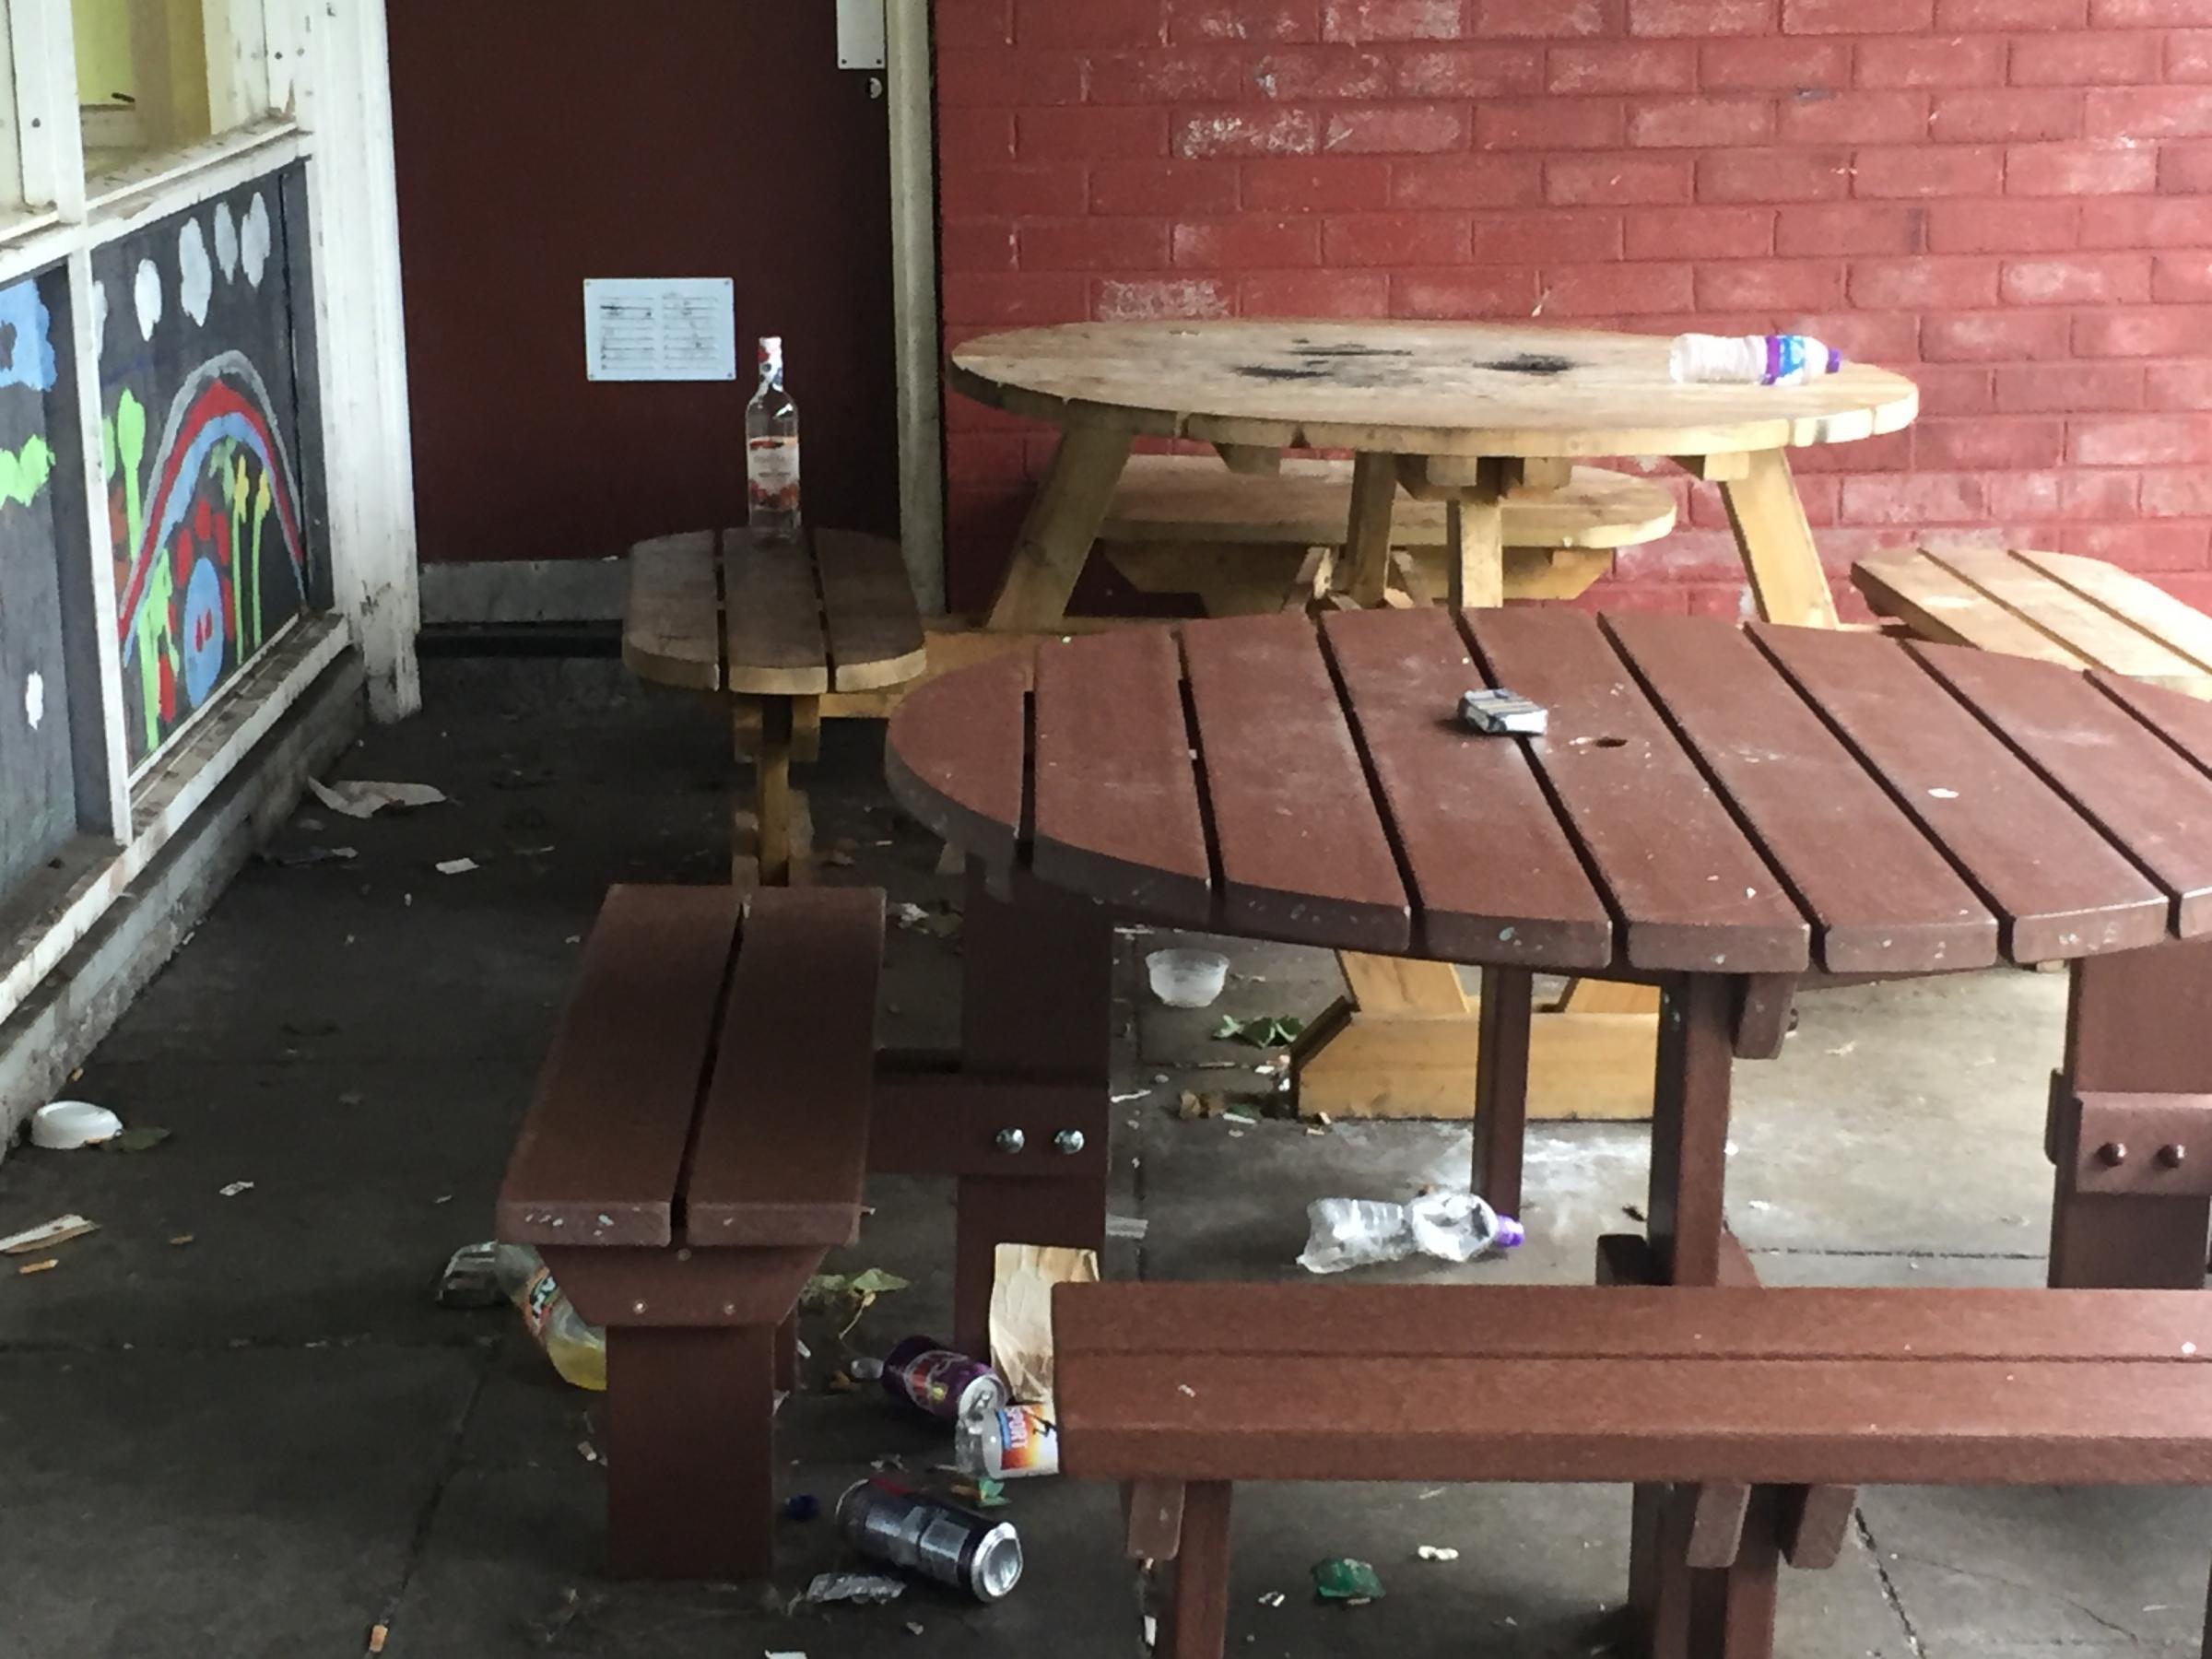 Vandalism and anti-social behaviour hits Cockenzie Primary School